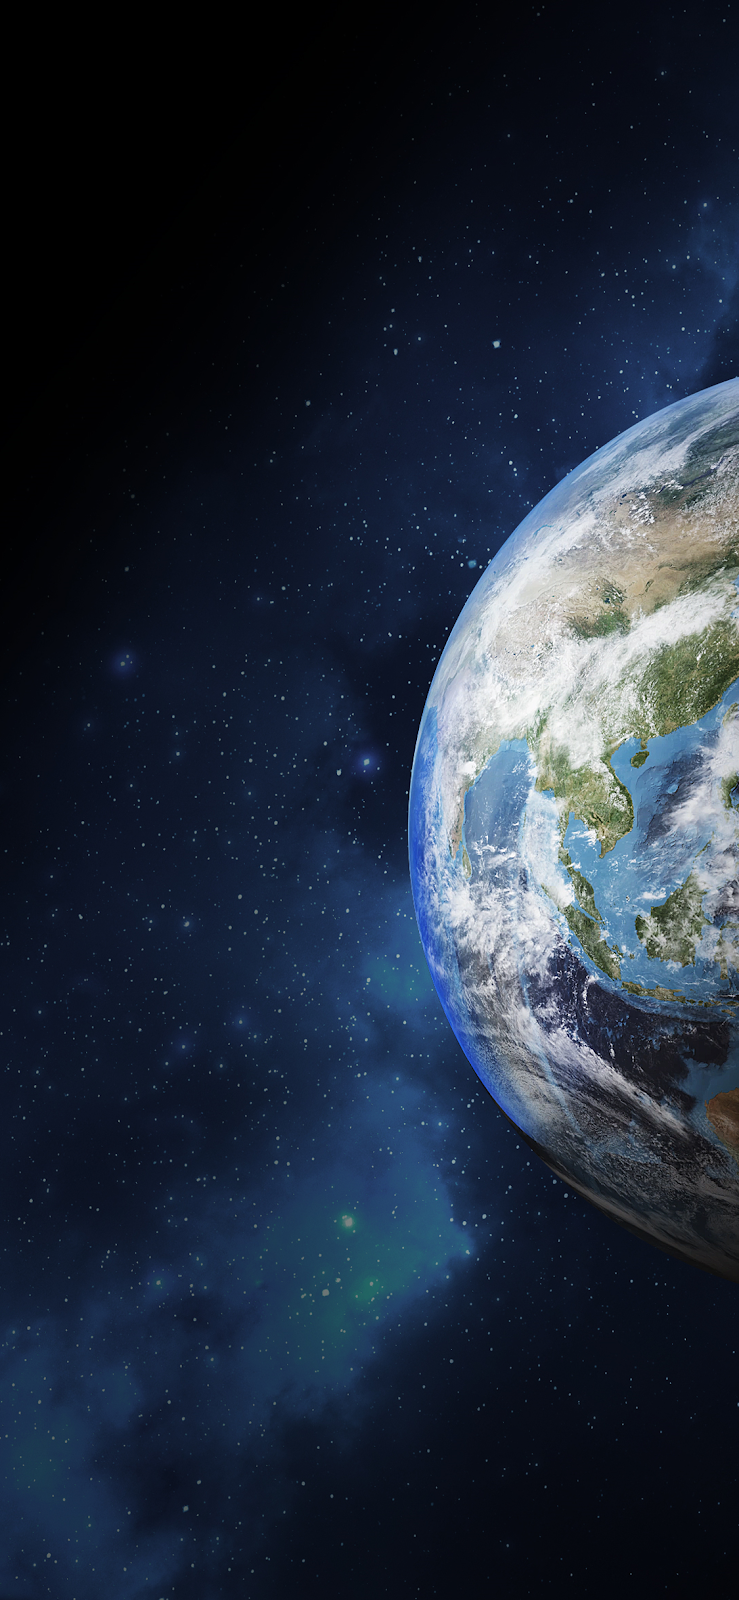 Earth Iphone X Fotografi Gambar Mobil